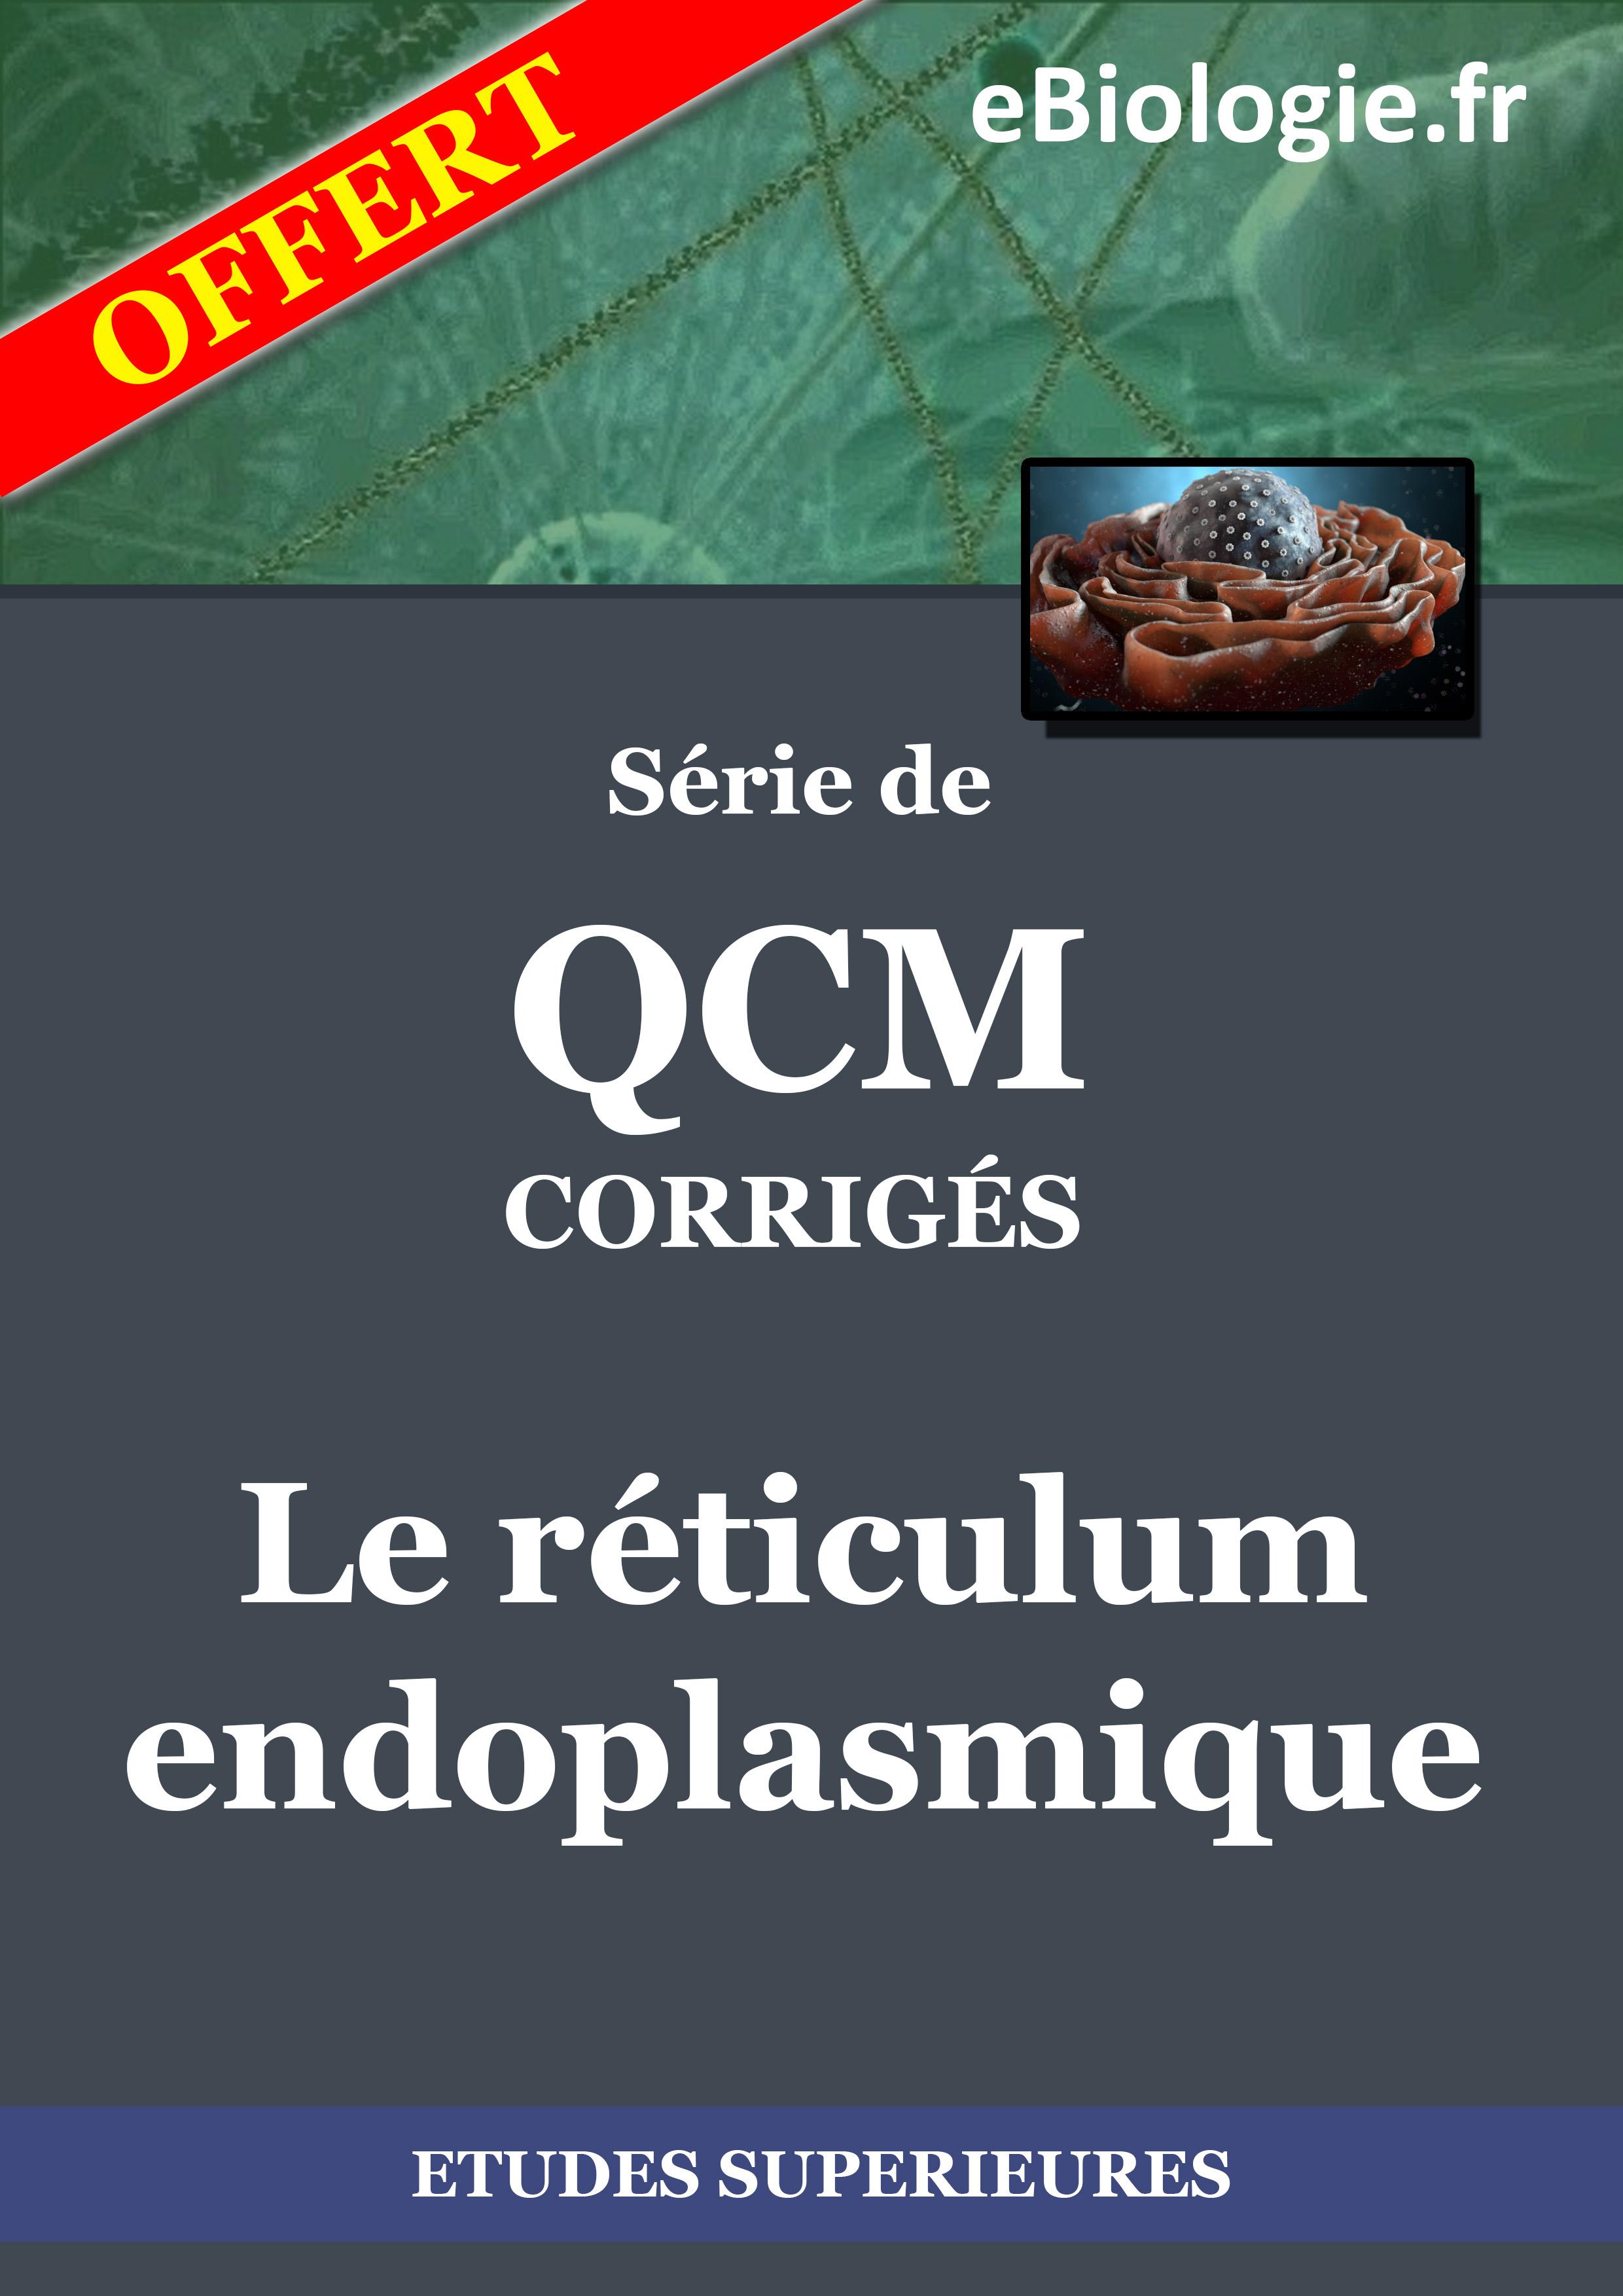 Ebook : eBook QCM Le réticulum endoplasmique